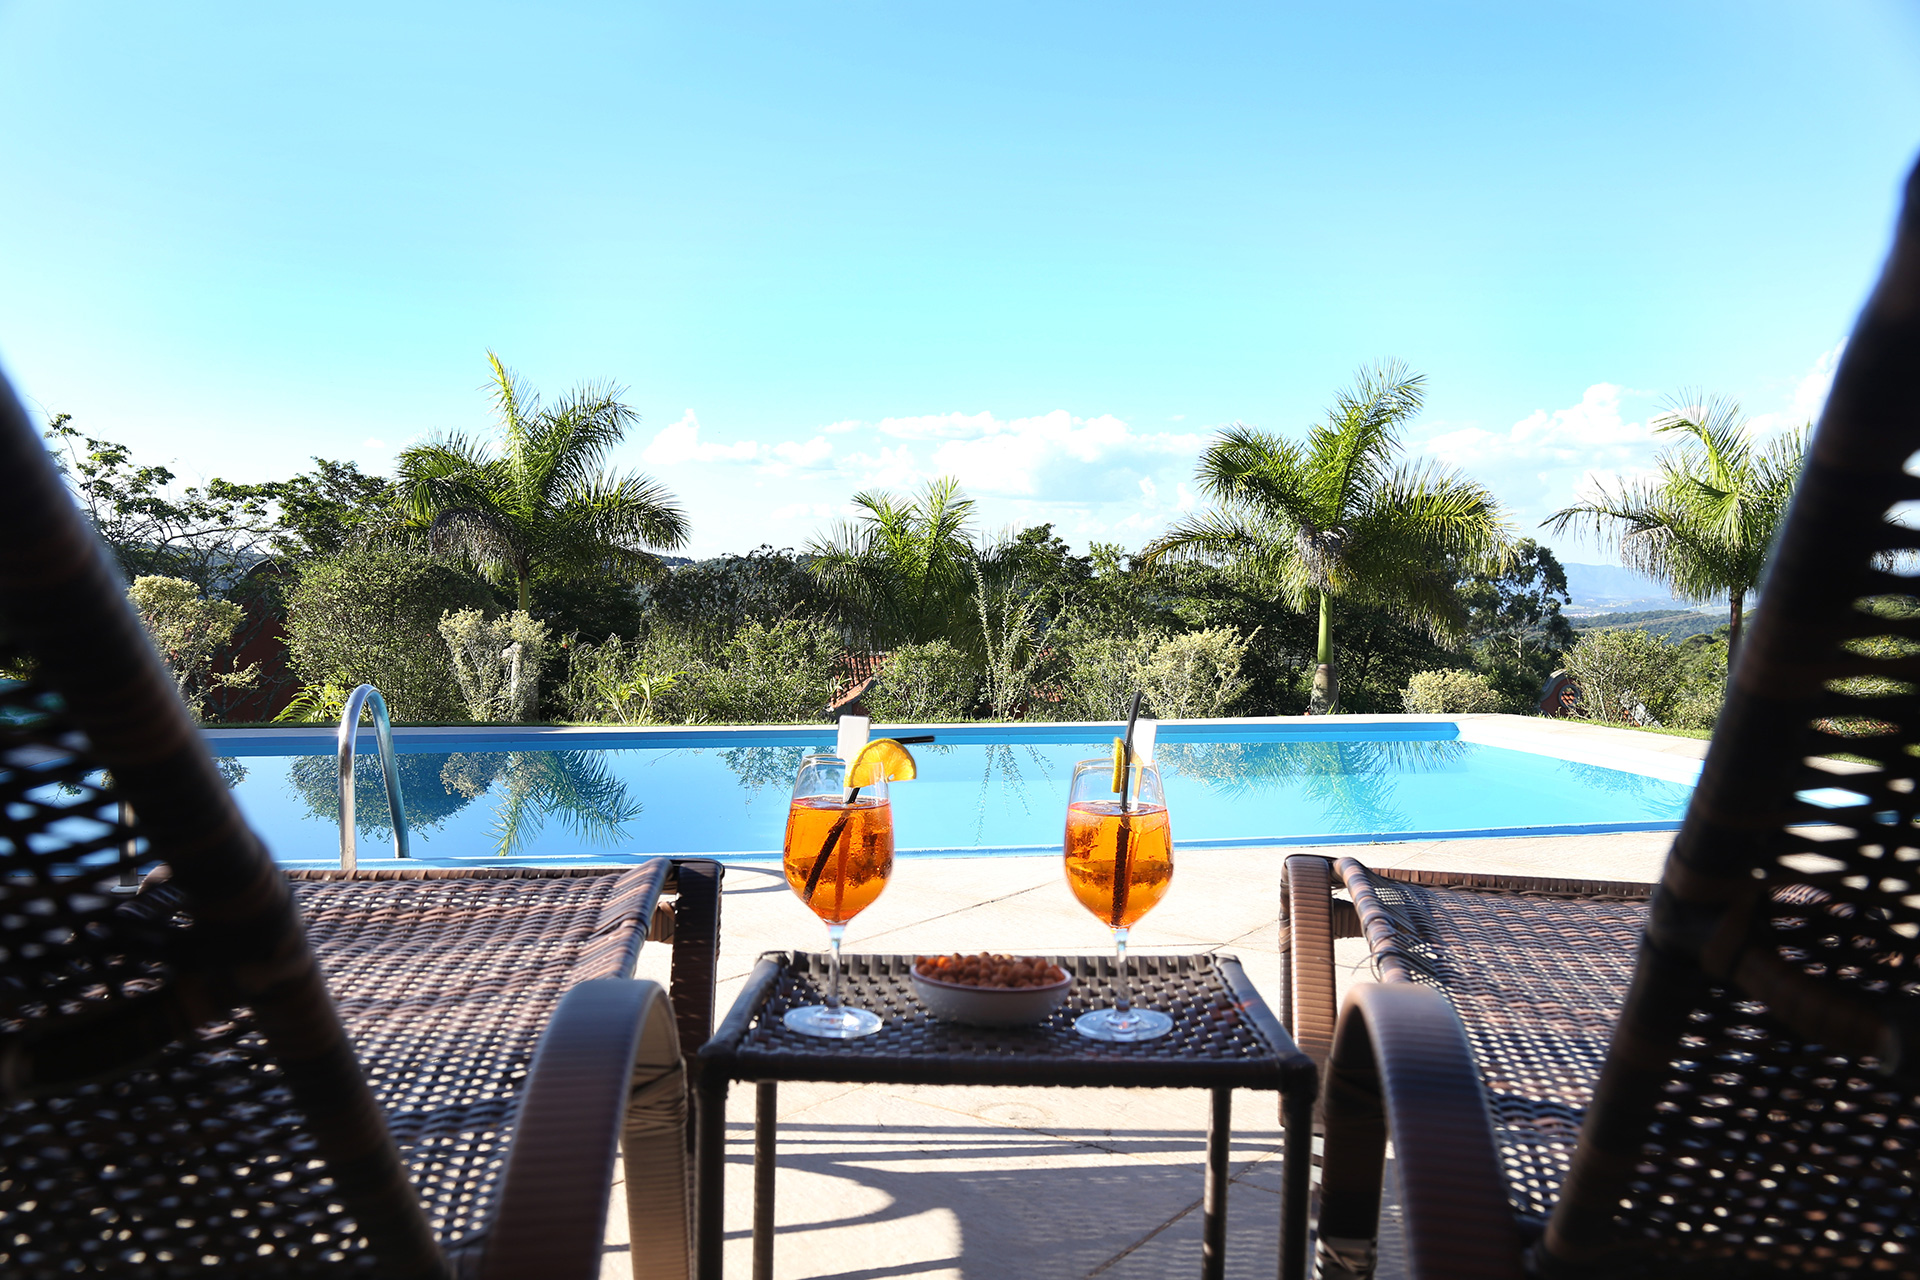 IMG_Hotel-Villa-Rossa-Sinfonia-das-Flores-Juba-Alves-Fotografia-sr-sp-140